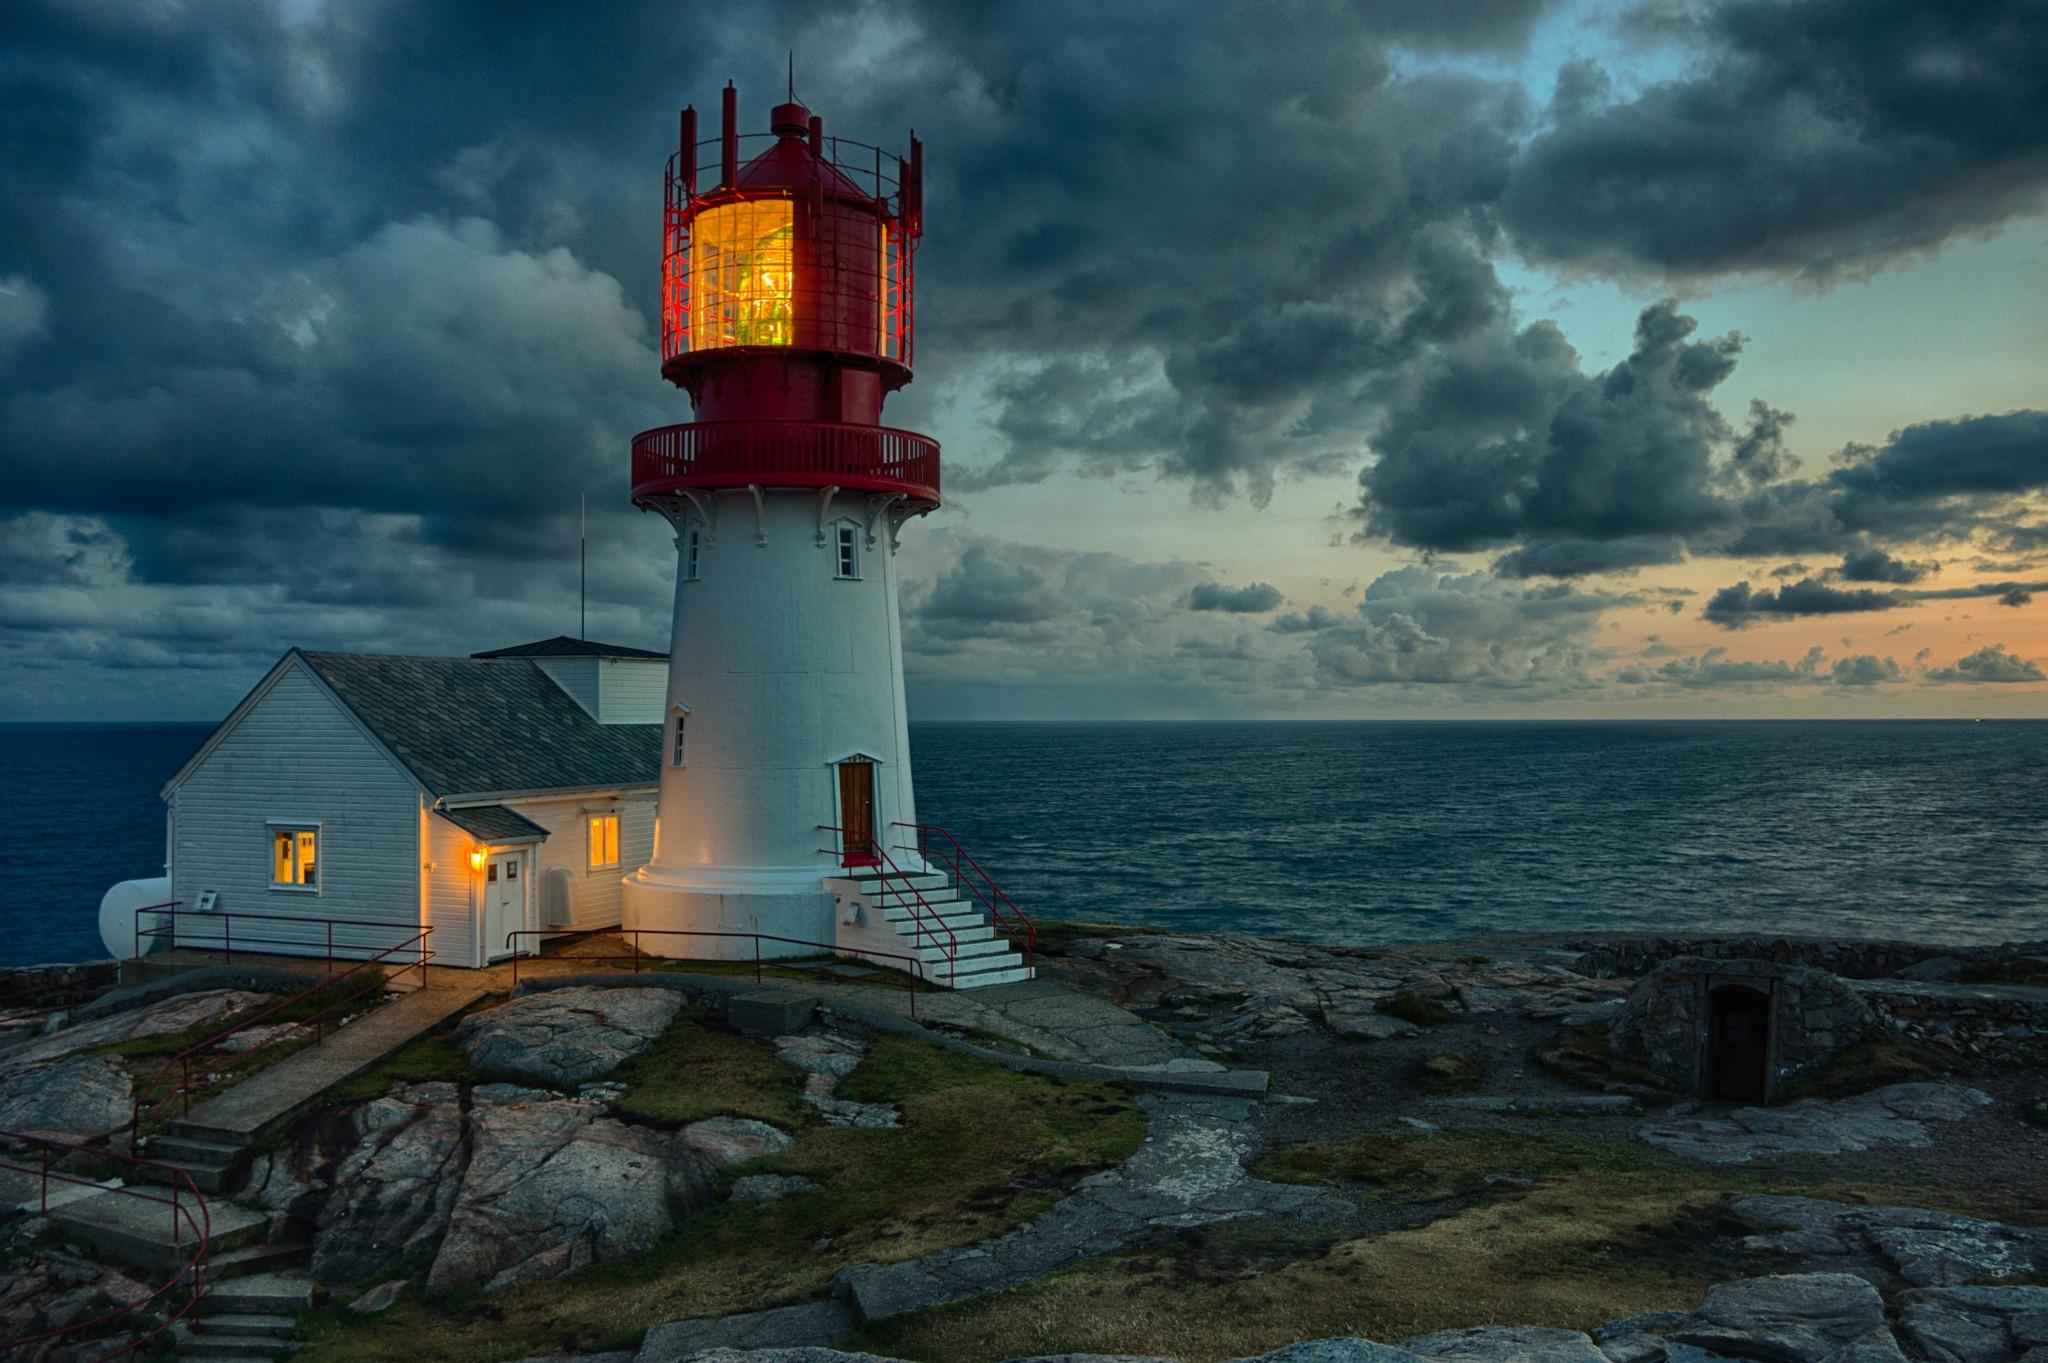 редко маяк в океане фото окрестностях